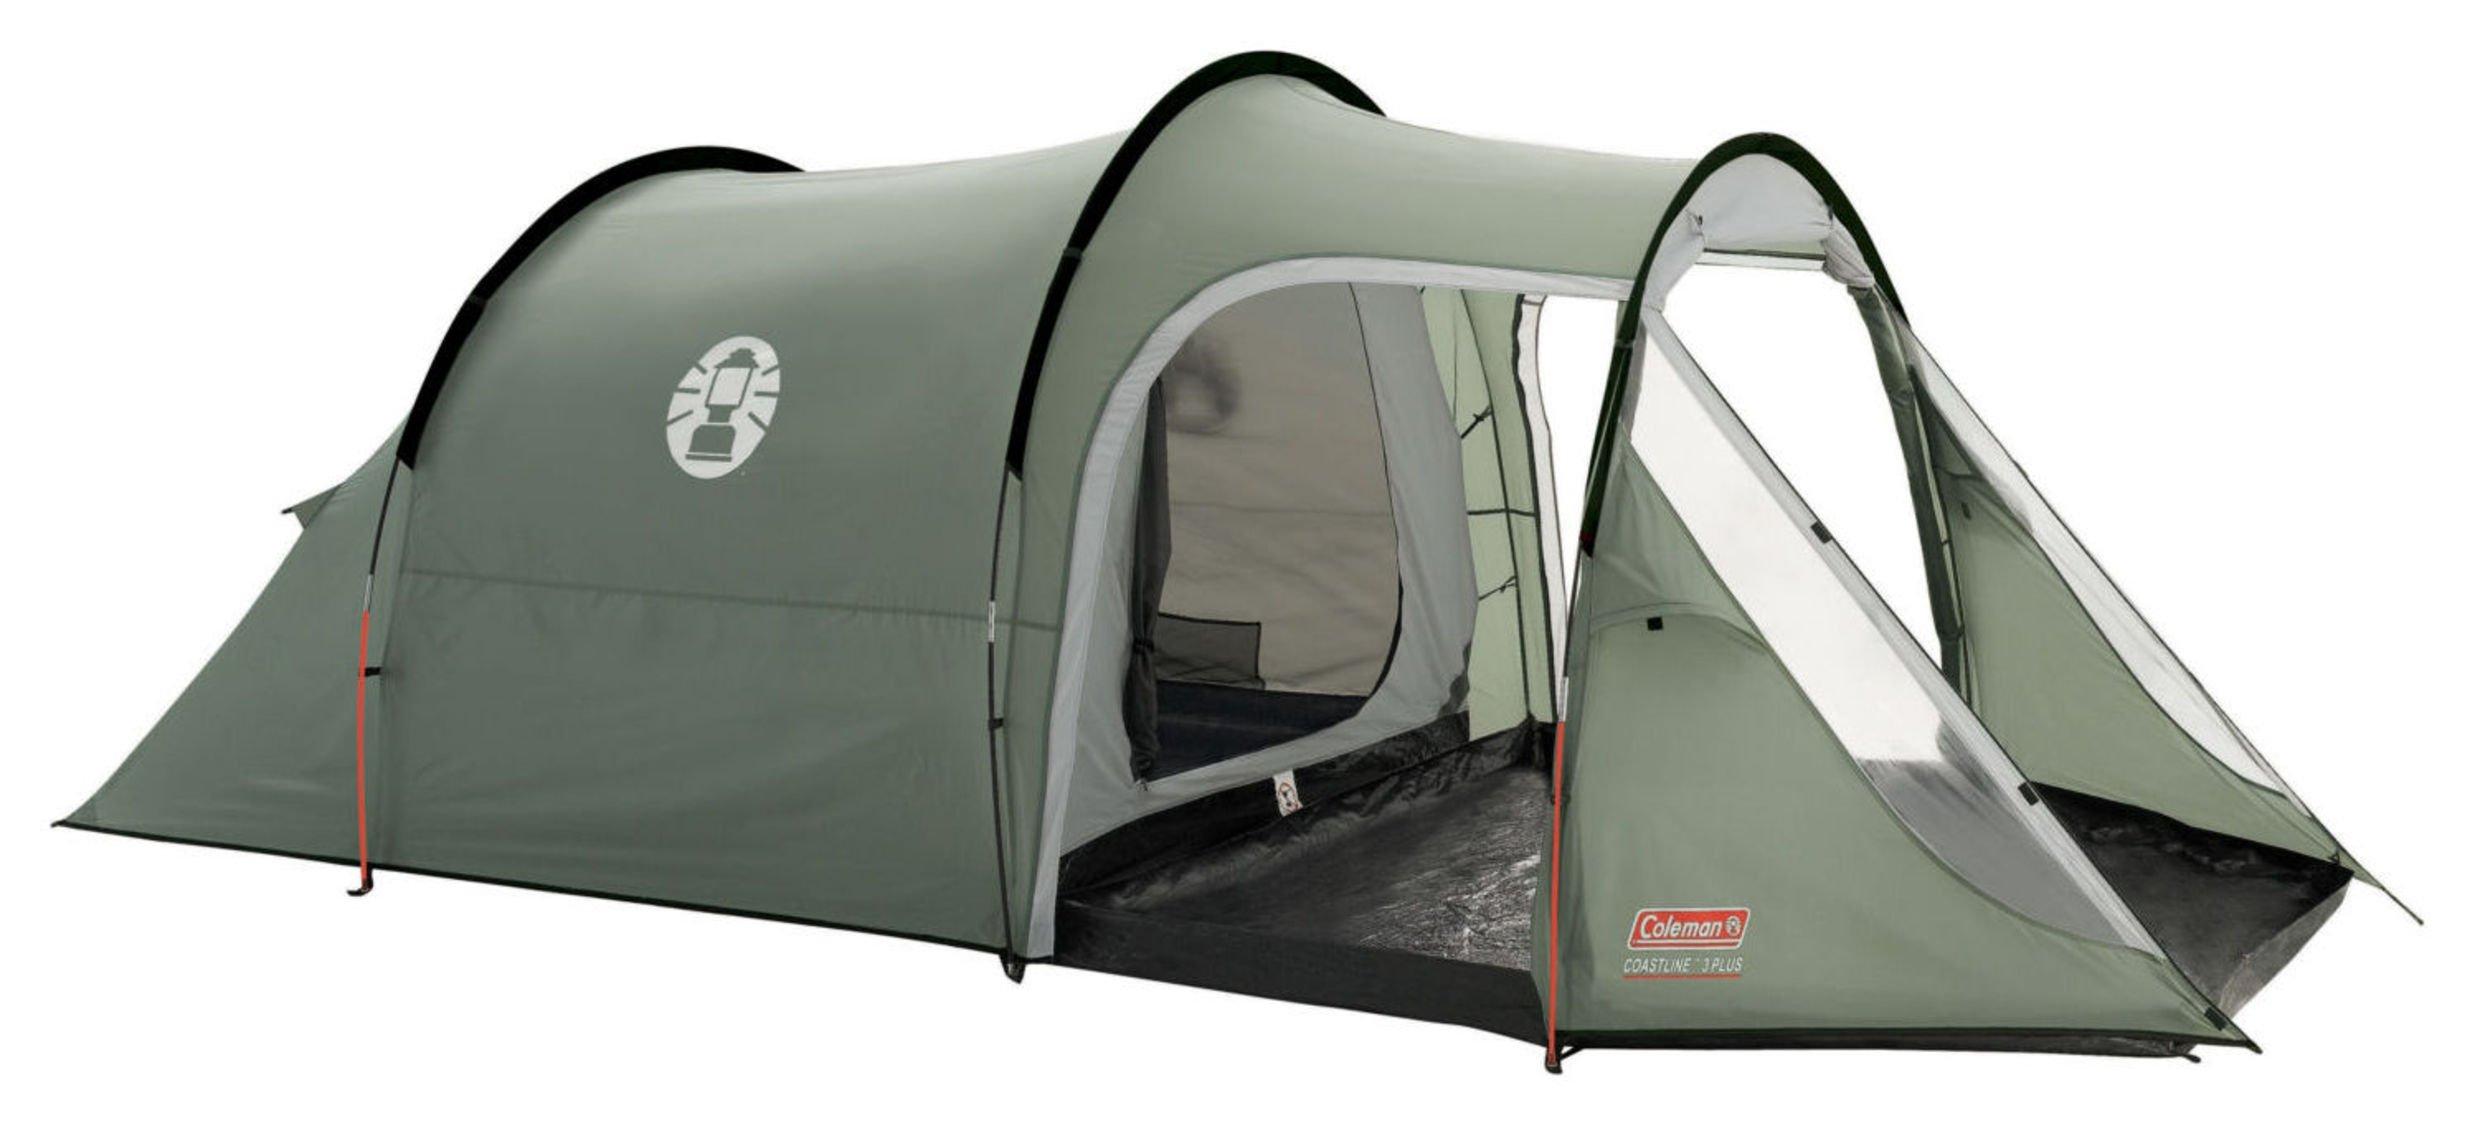 Image of Coleman Coastline 3 Man 2 Room Tunnel Tent